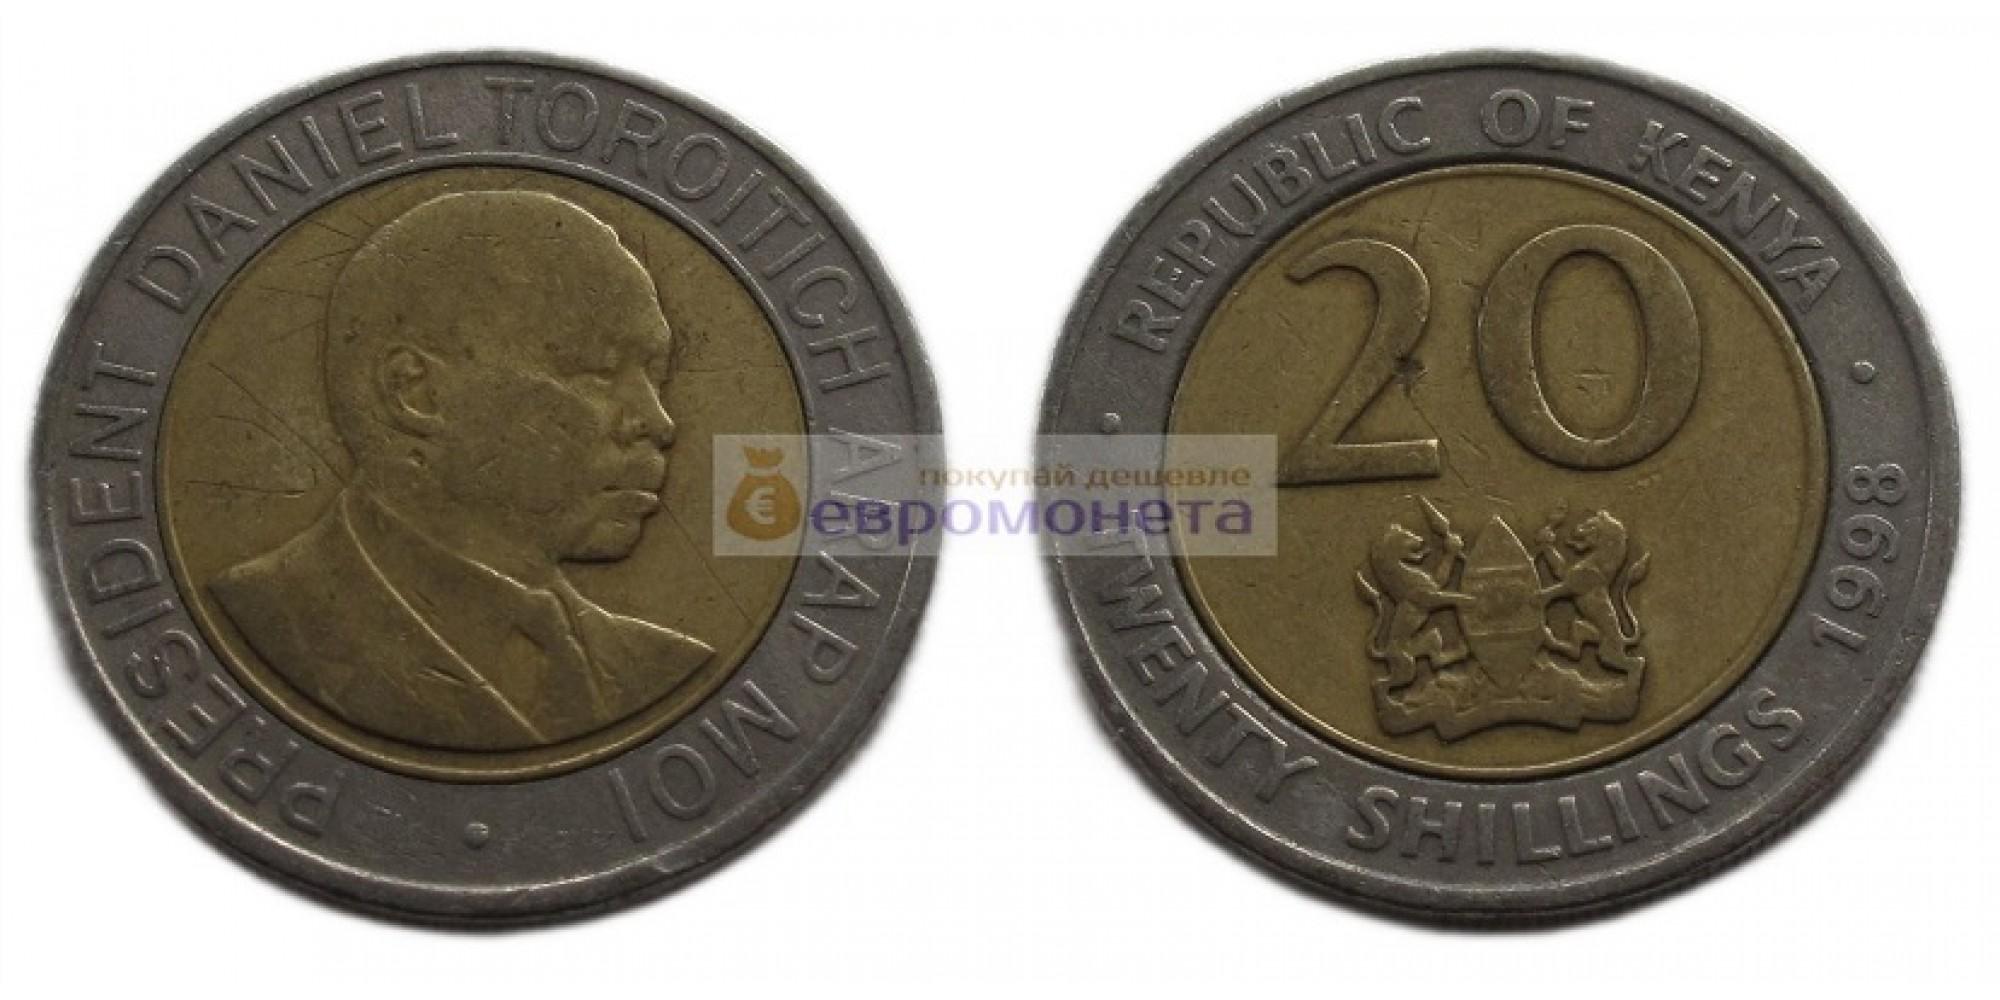 Кения 20 шиллингов 1998 год. Биметалл